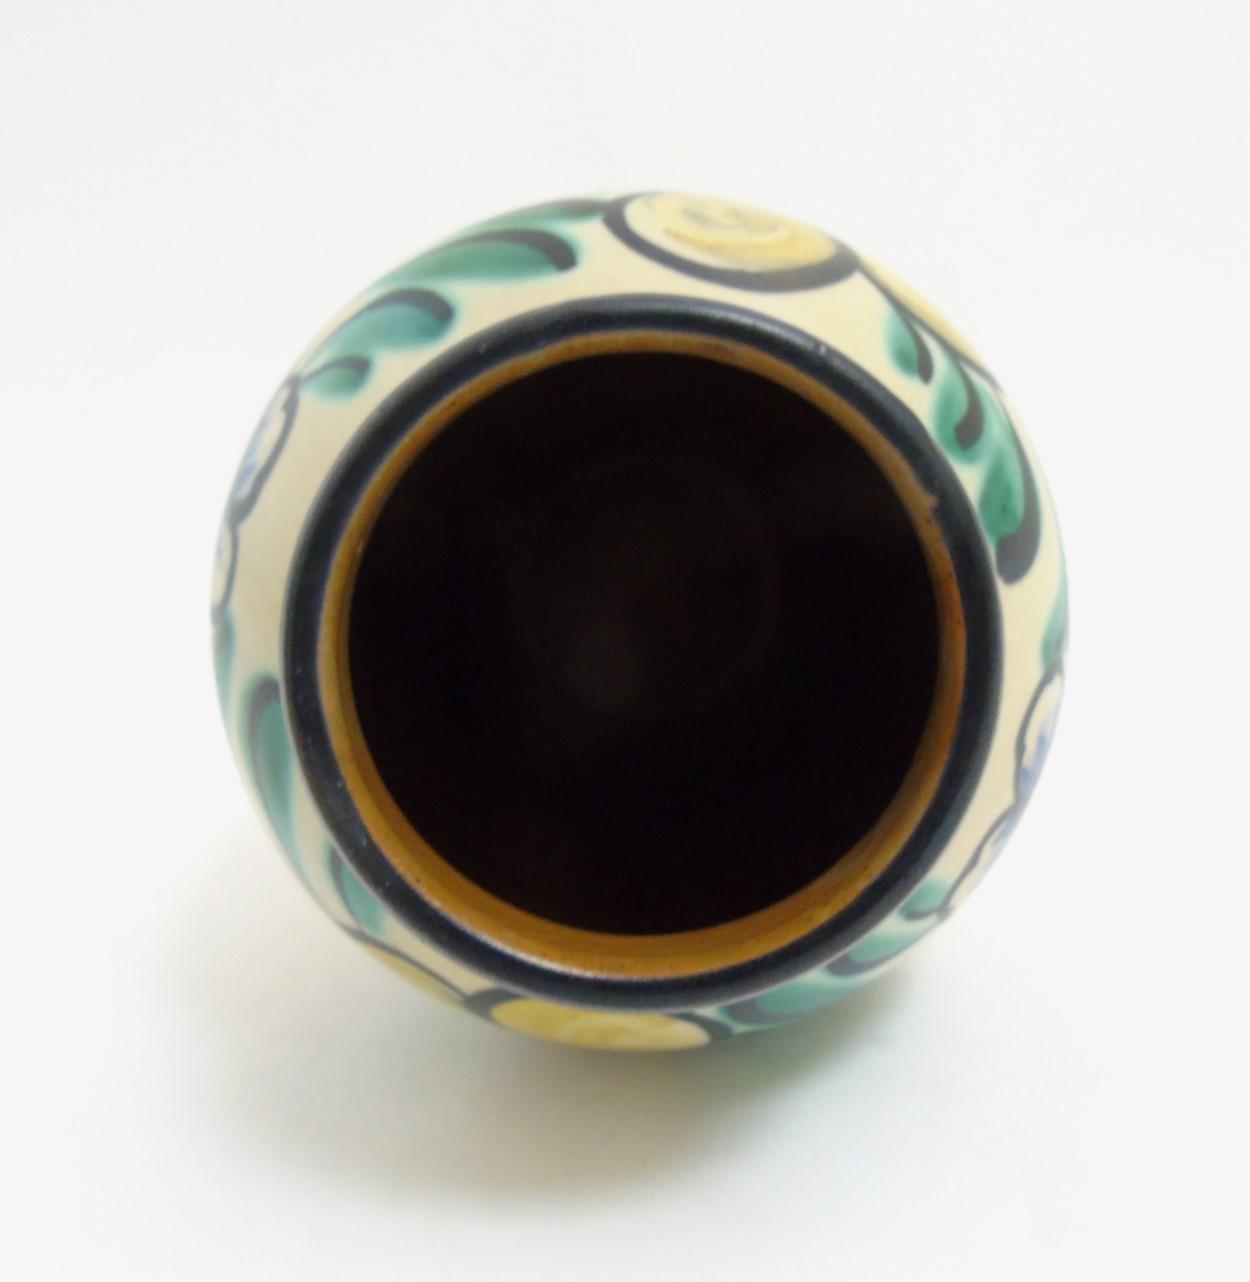 Lot 59 - Scandinavian Studio Pottery: A Swedish vase by Ekeby, Uppsala, Sweden, makers mark to base,